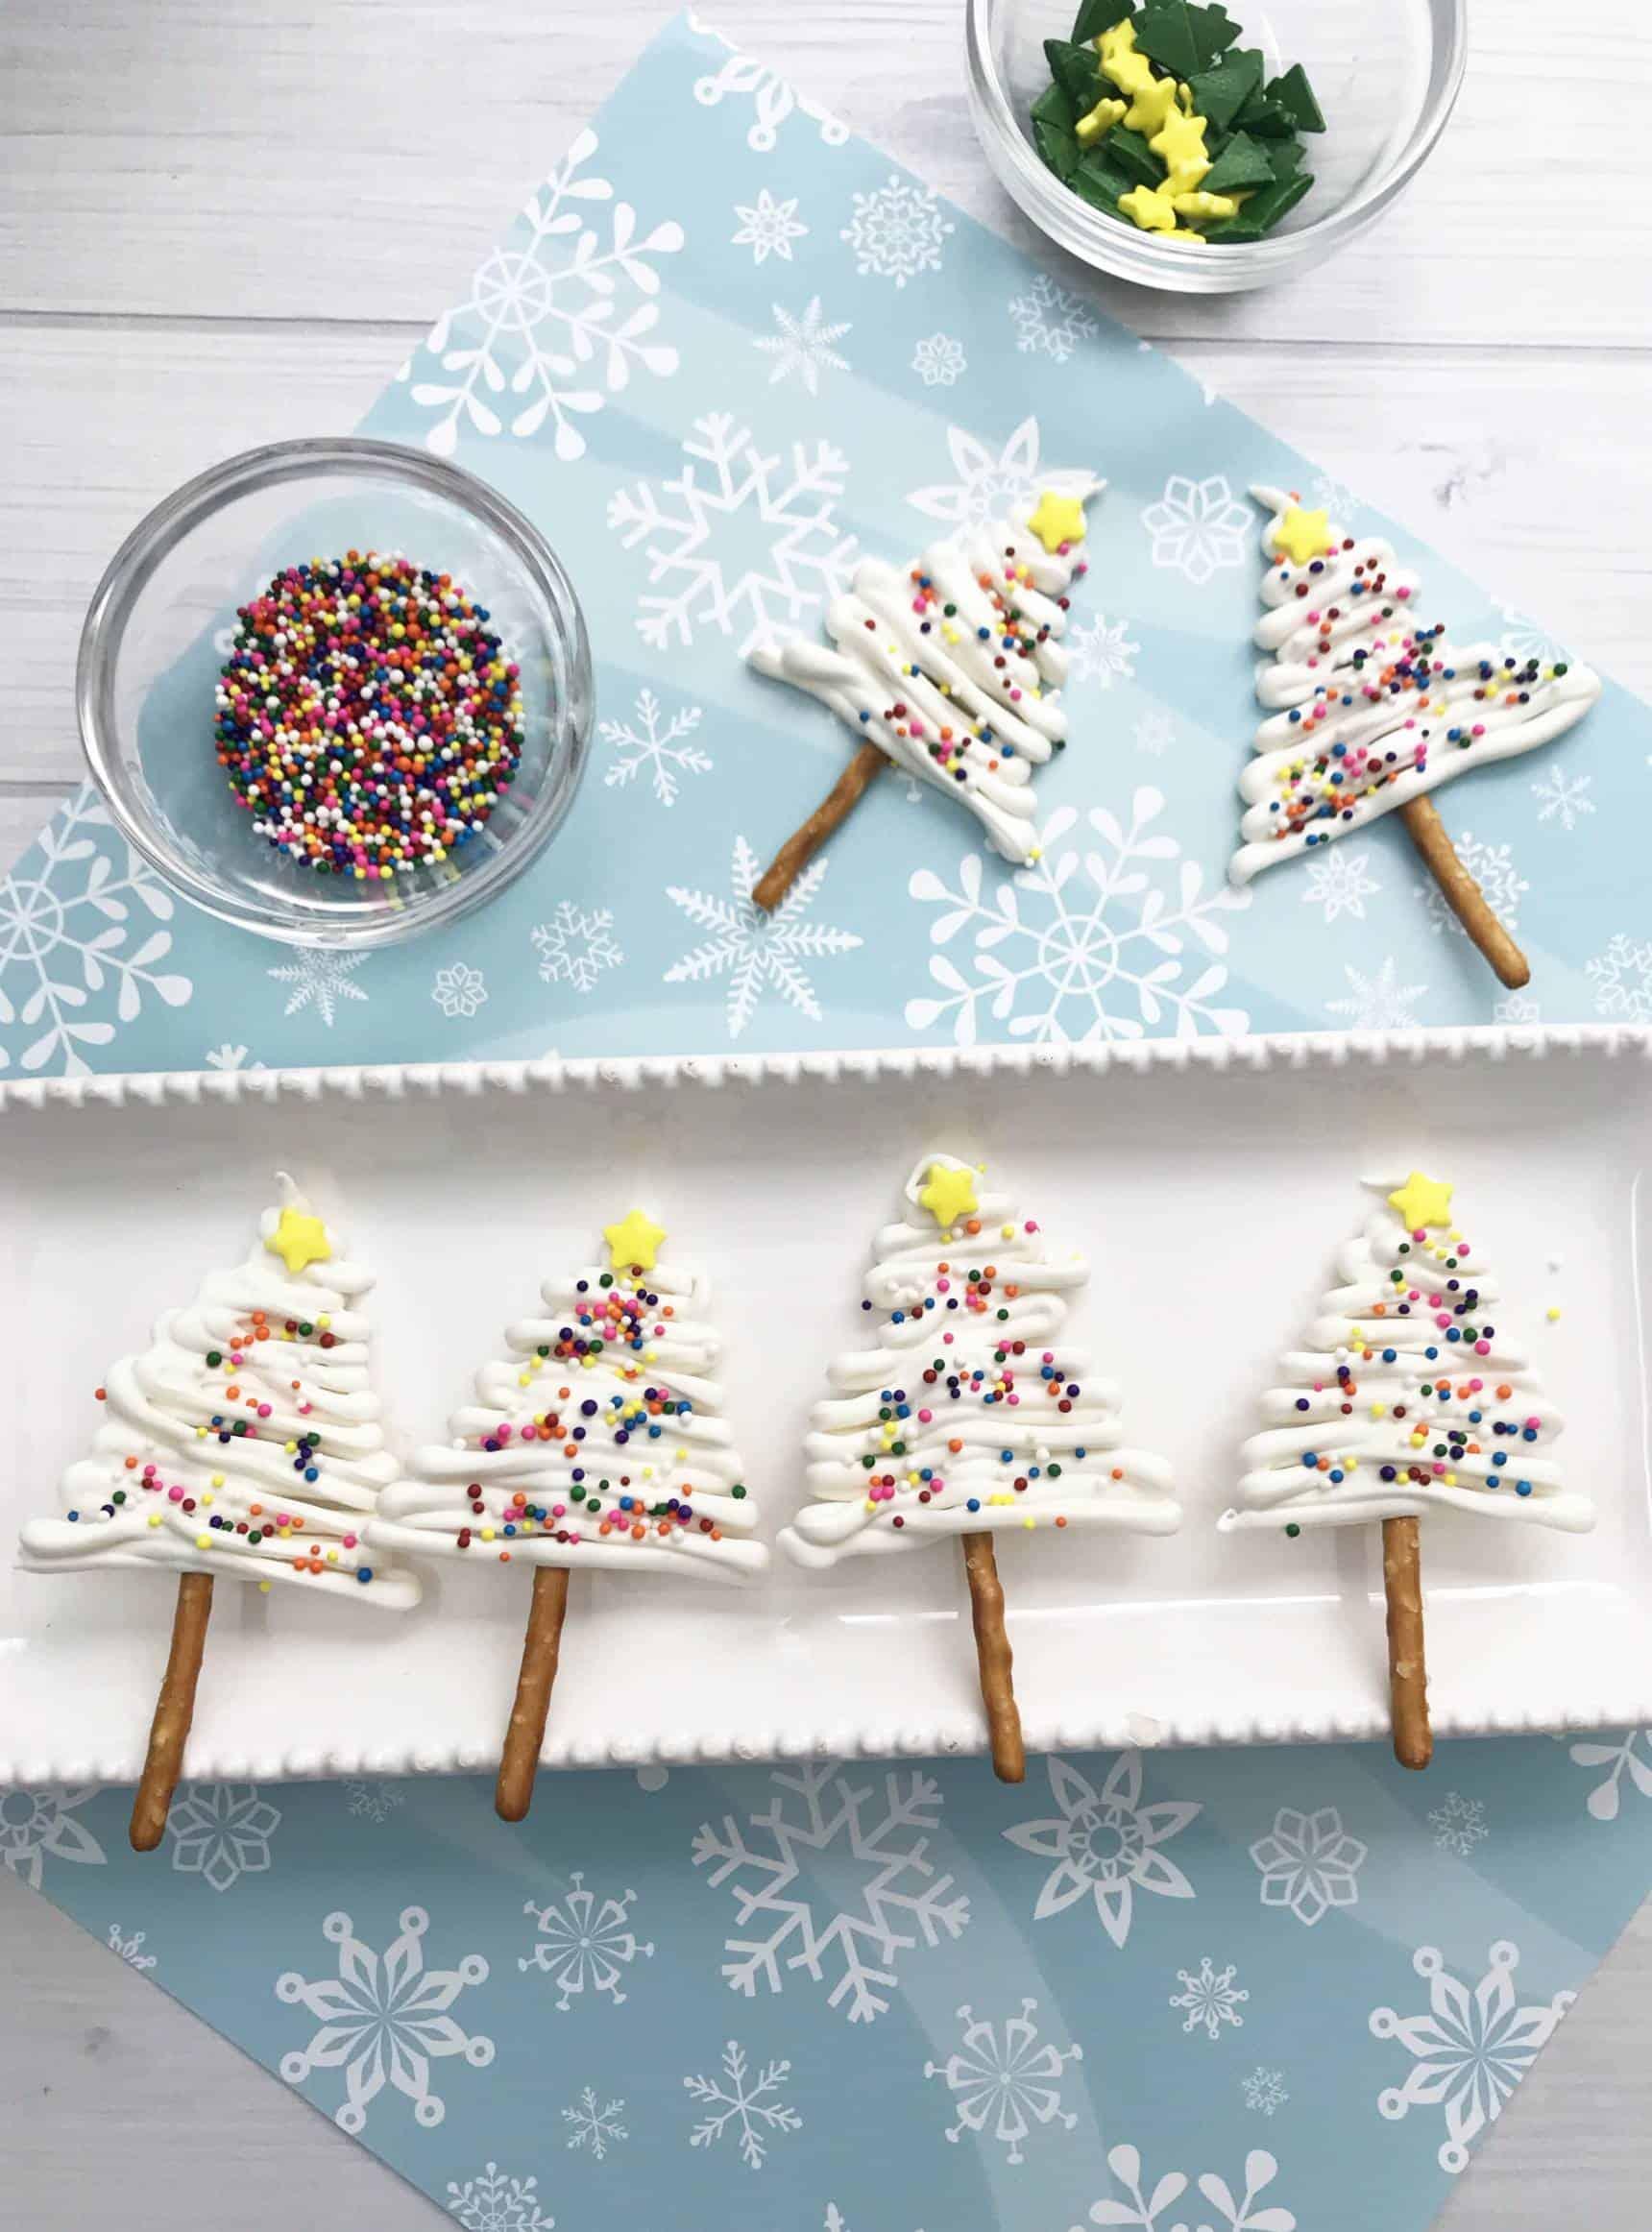 Pretzel and Chocolate Christmas Trees